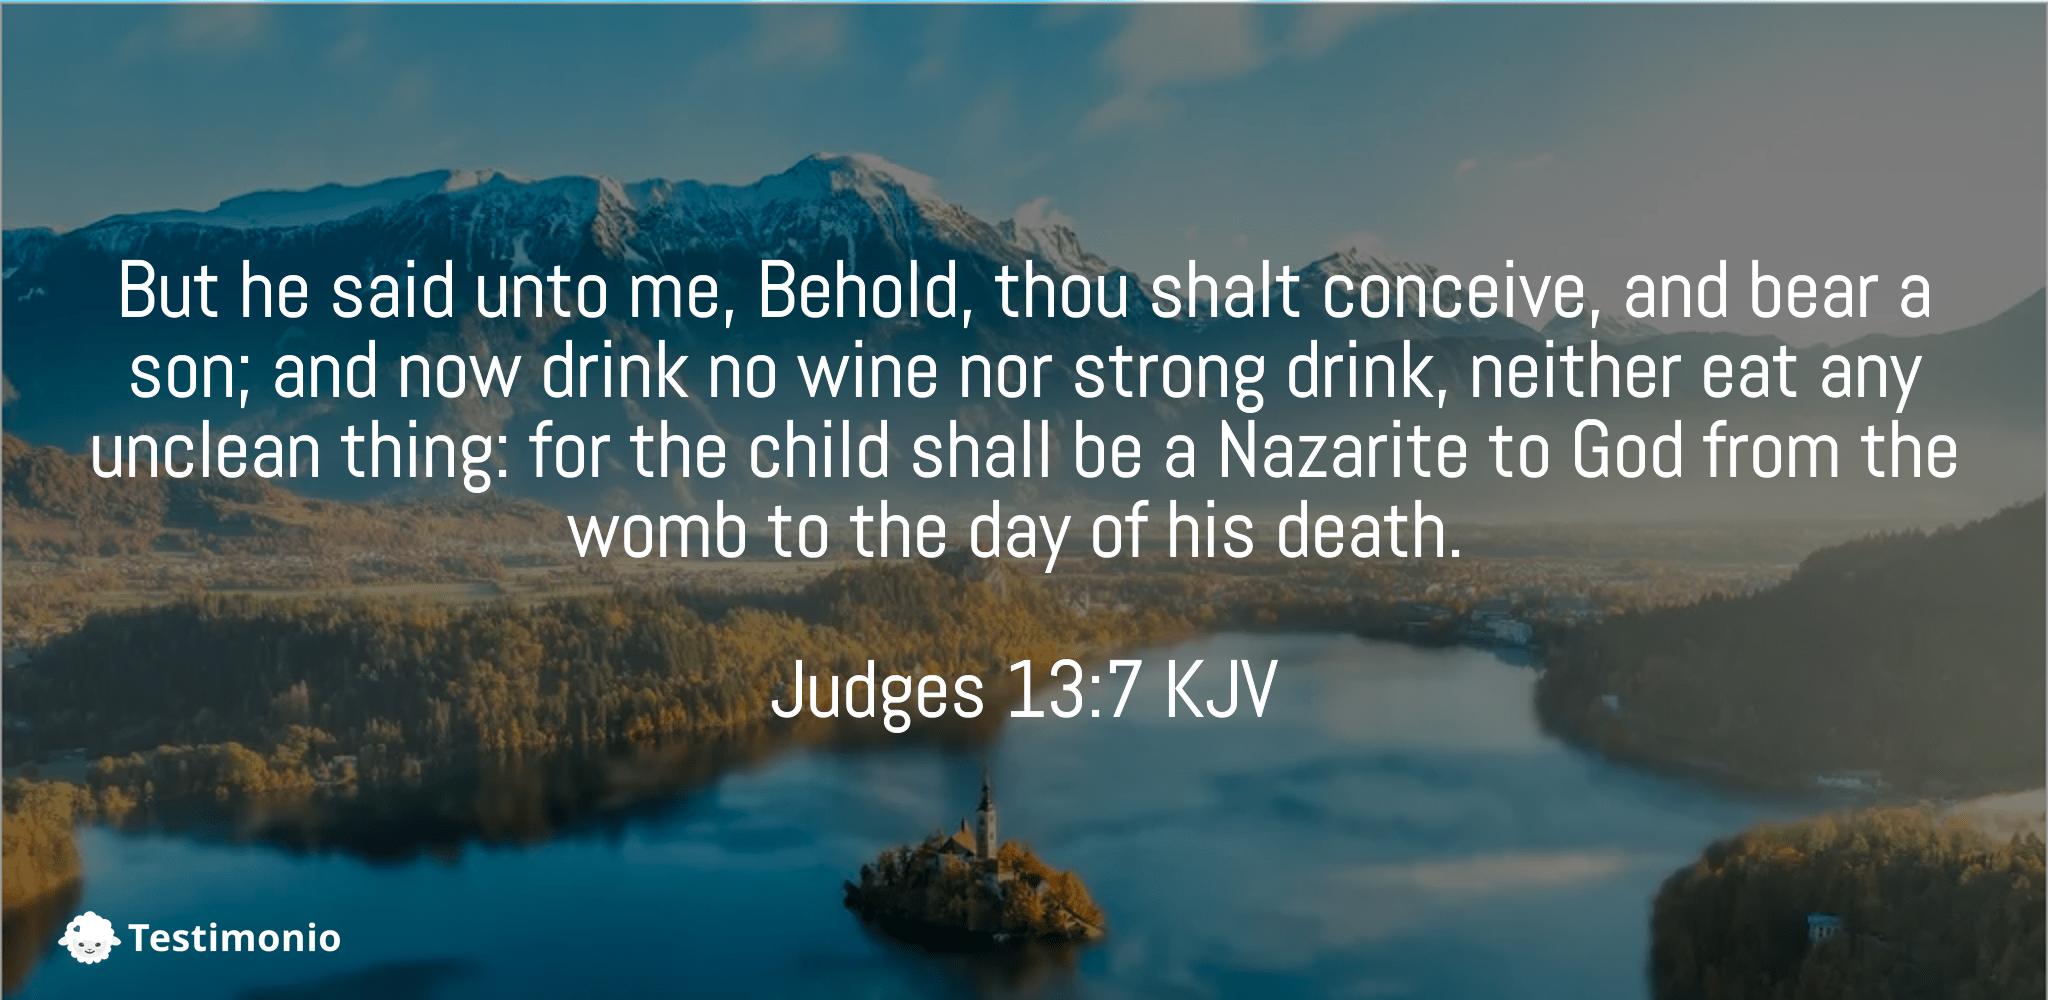 Judges 13:7